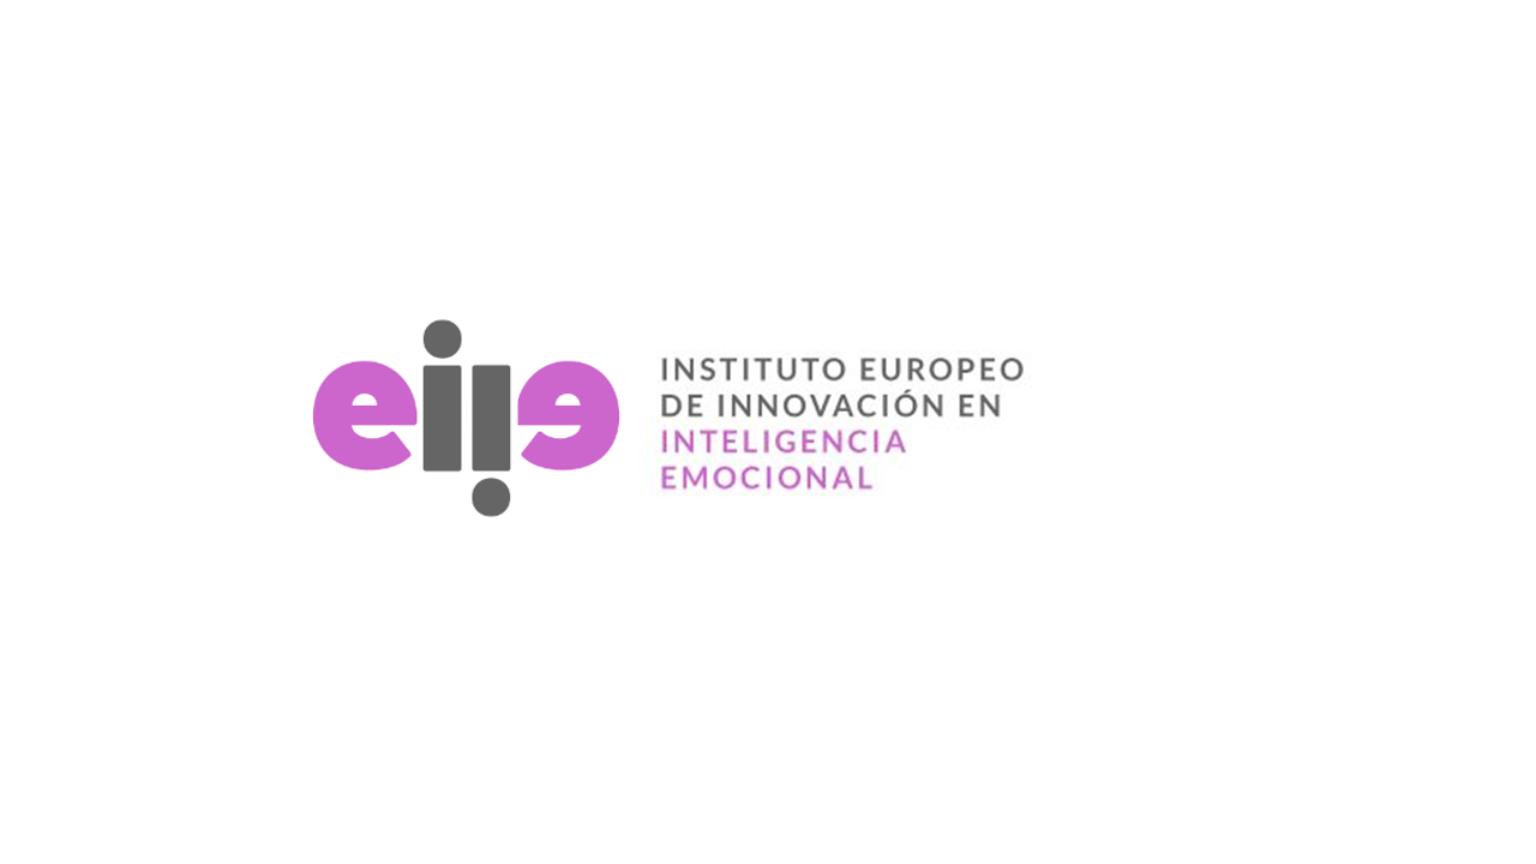 Instituto Europeo de Innovación en Inteligencia Emocional